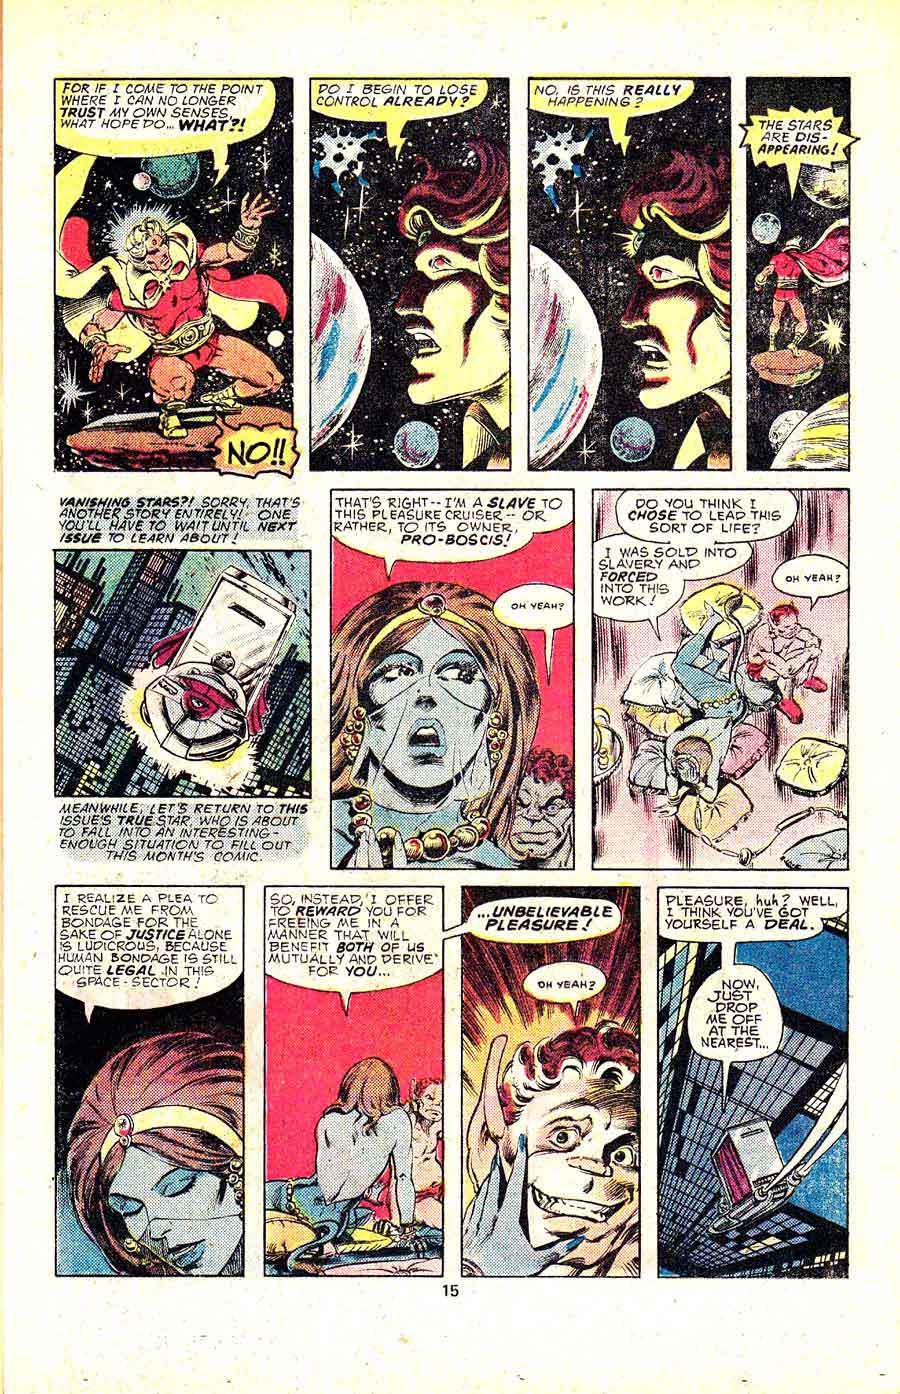 Warlock v1 #12 marvel 1970s bronze age comic book page art by Jim Starlin